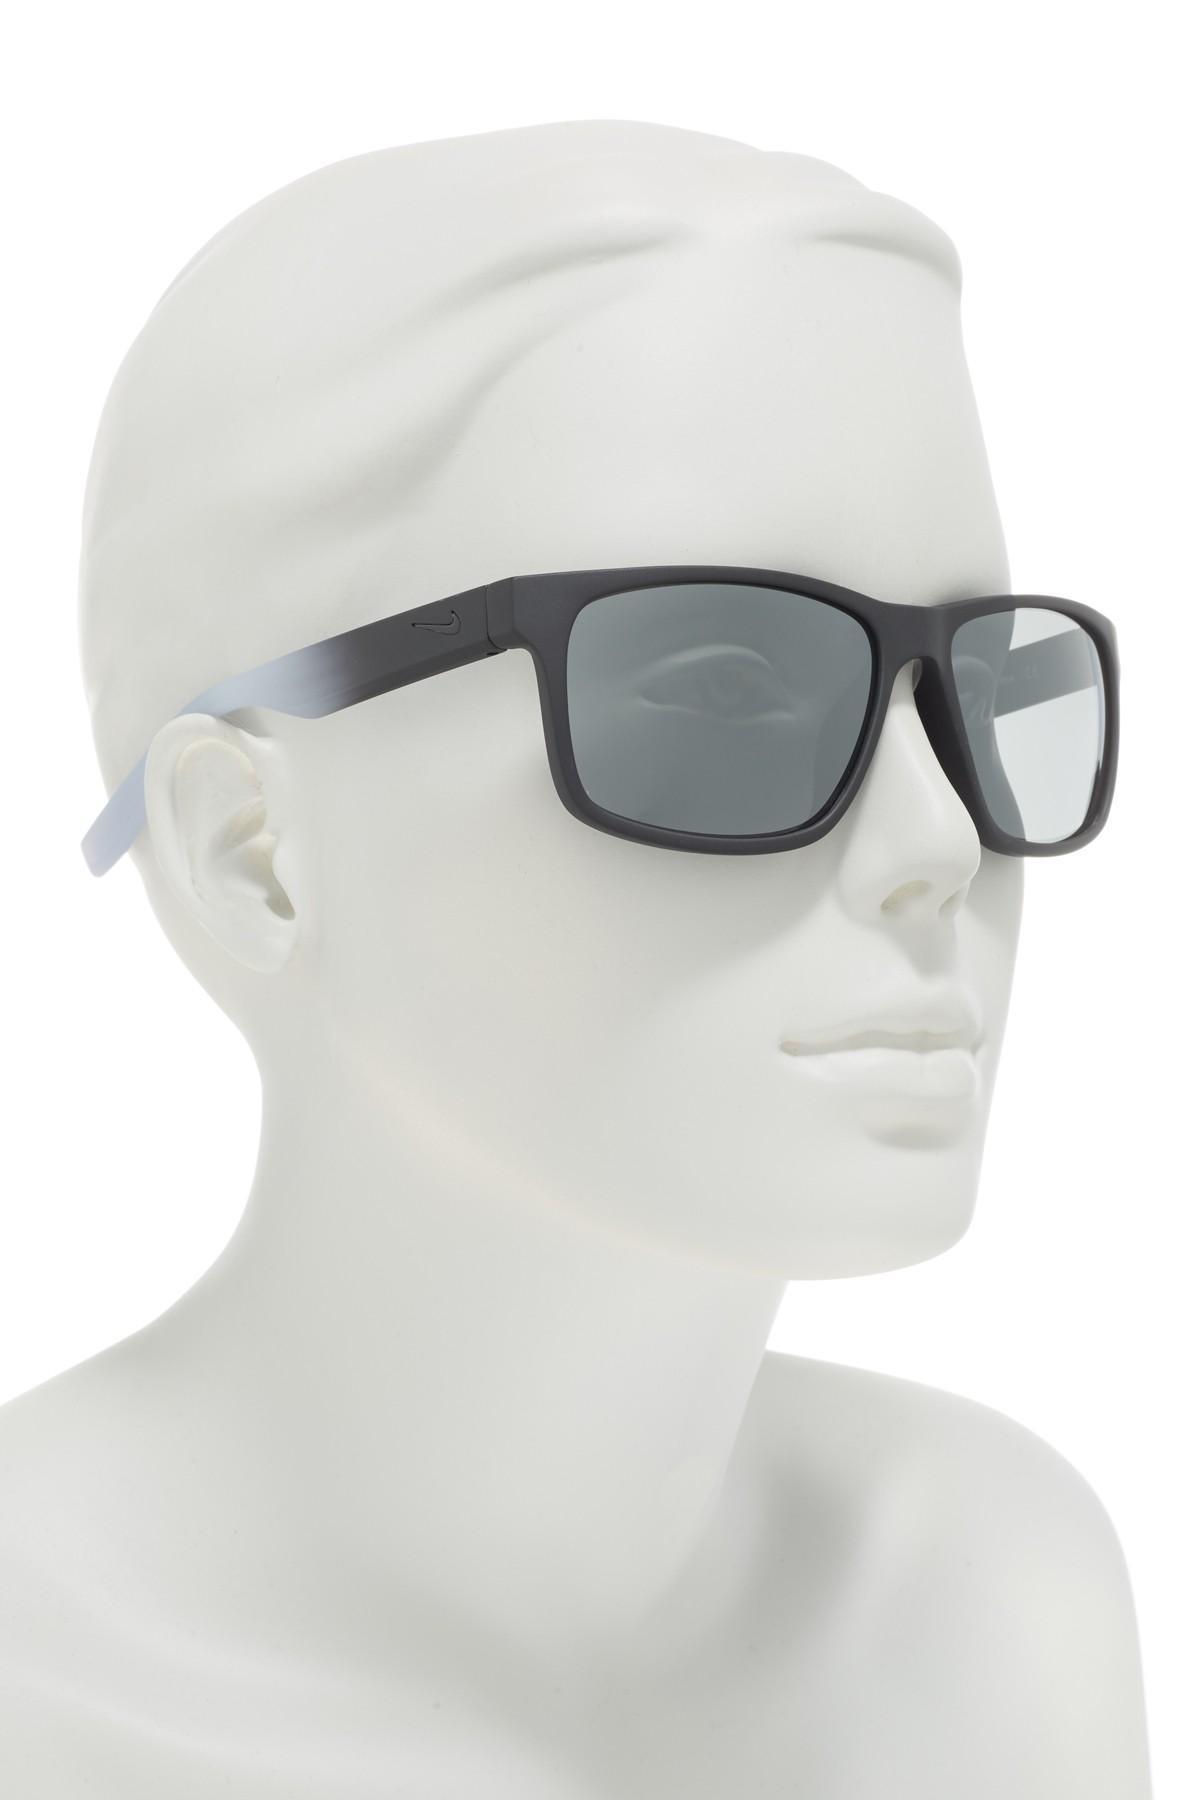 897e91e4f1 Nike - Gray Cruiser 59mm Square Sunglasses for Men - Lyst. View fullscreen